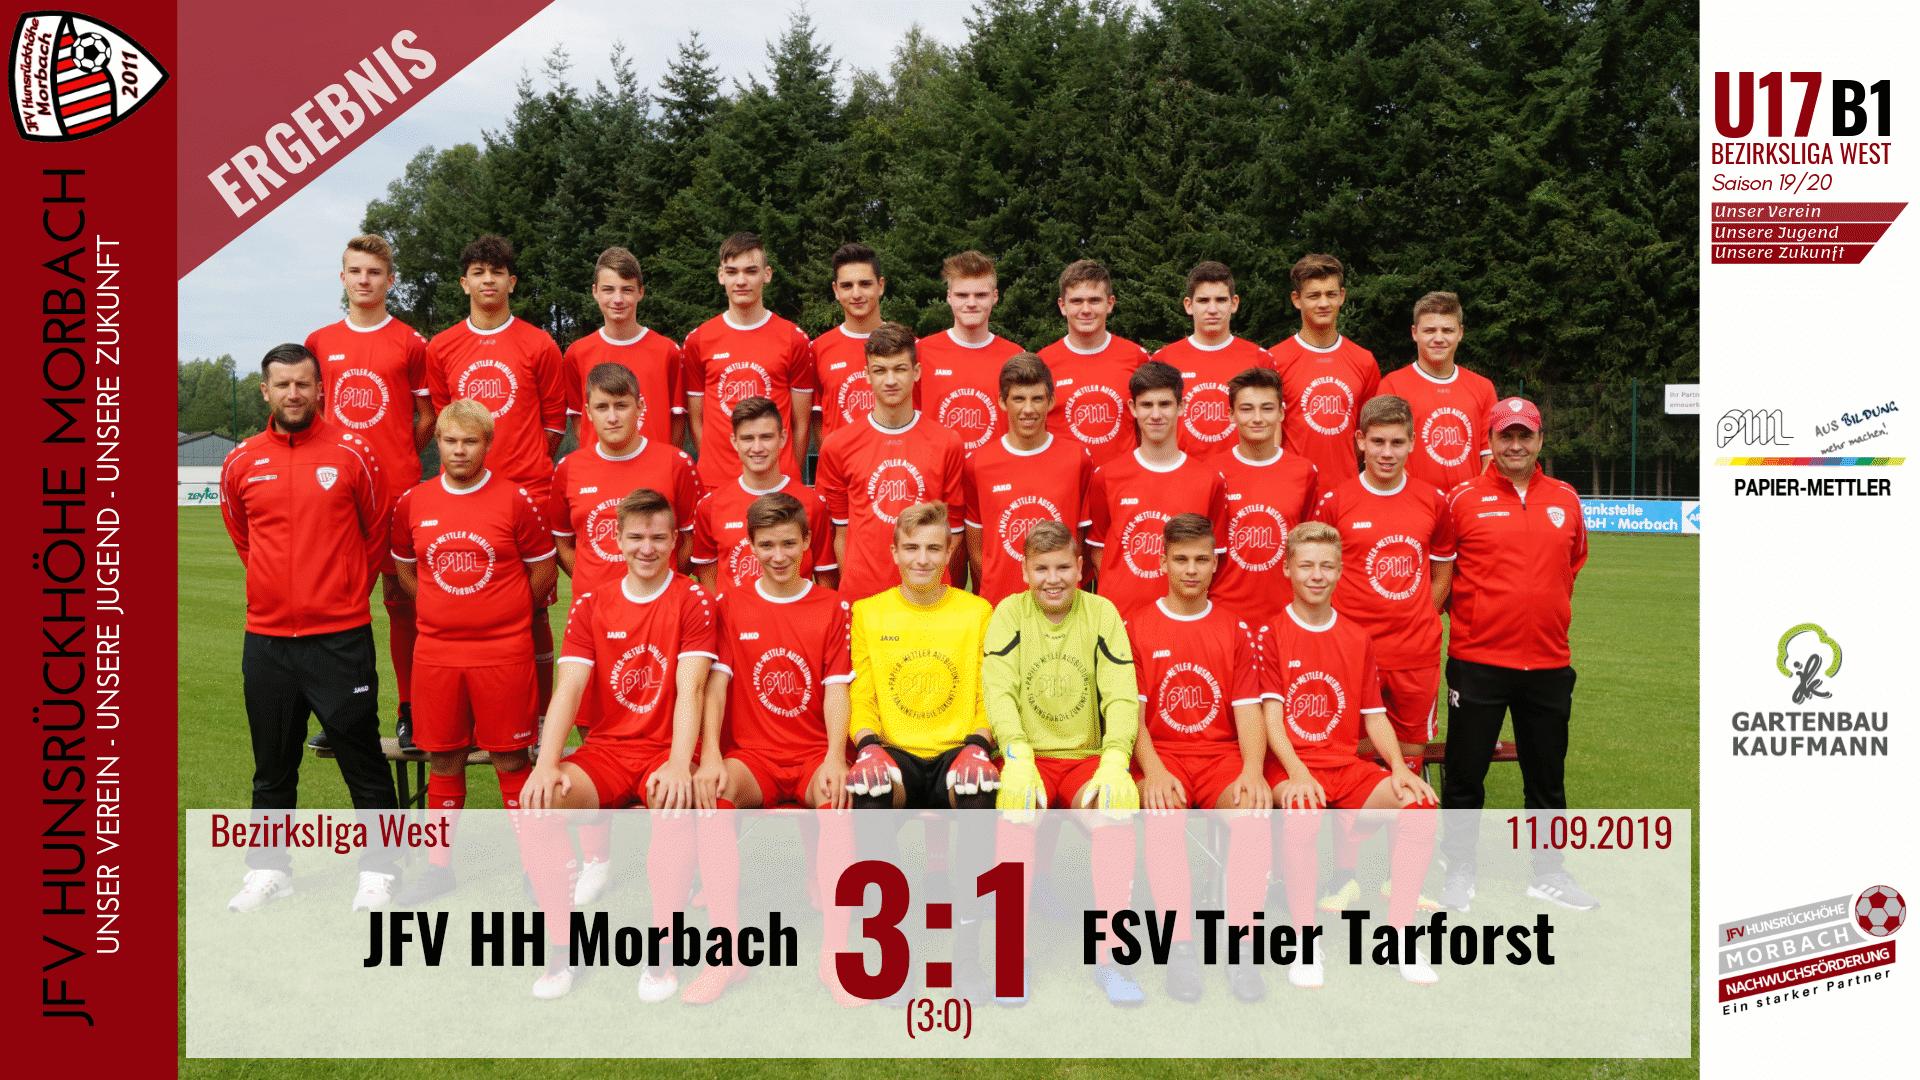 U17 B1: JFV Hunsrückhöhe Morbach – FSV Trier Tarforst 3:1 (3:0)